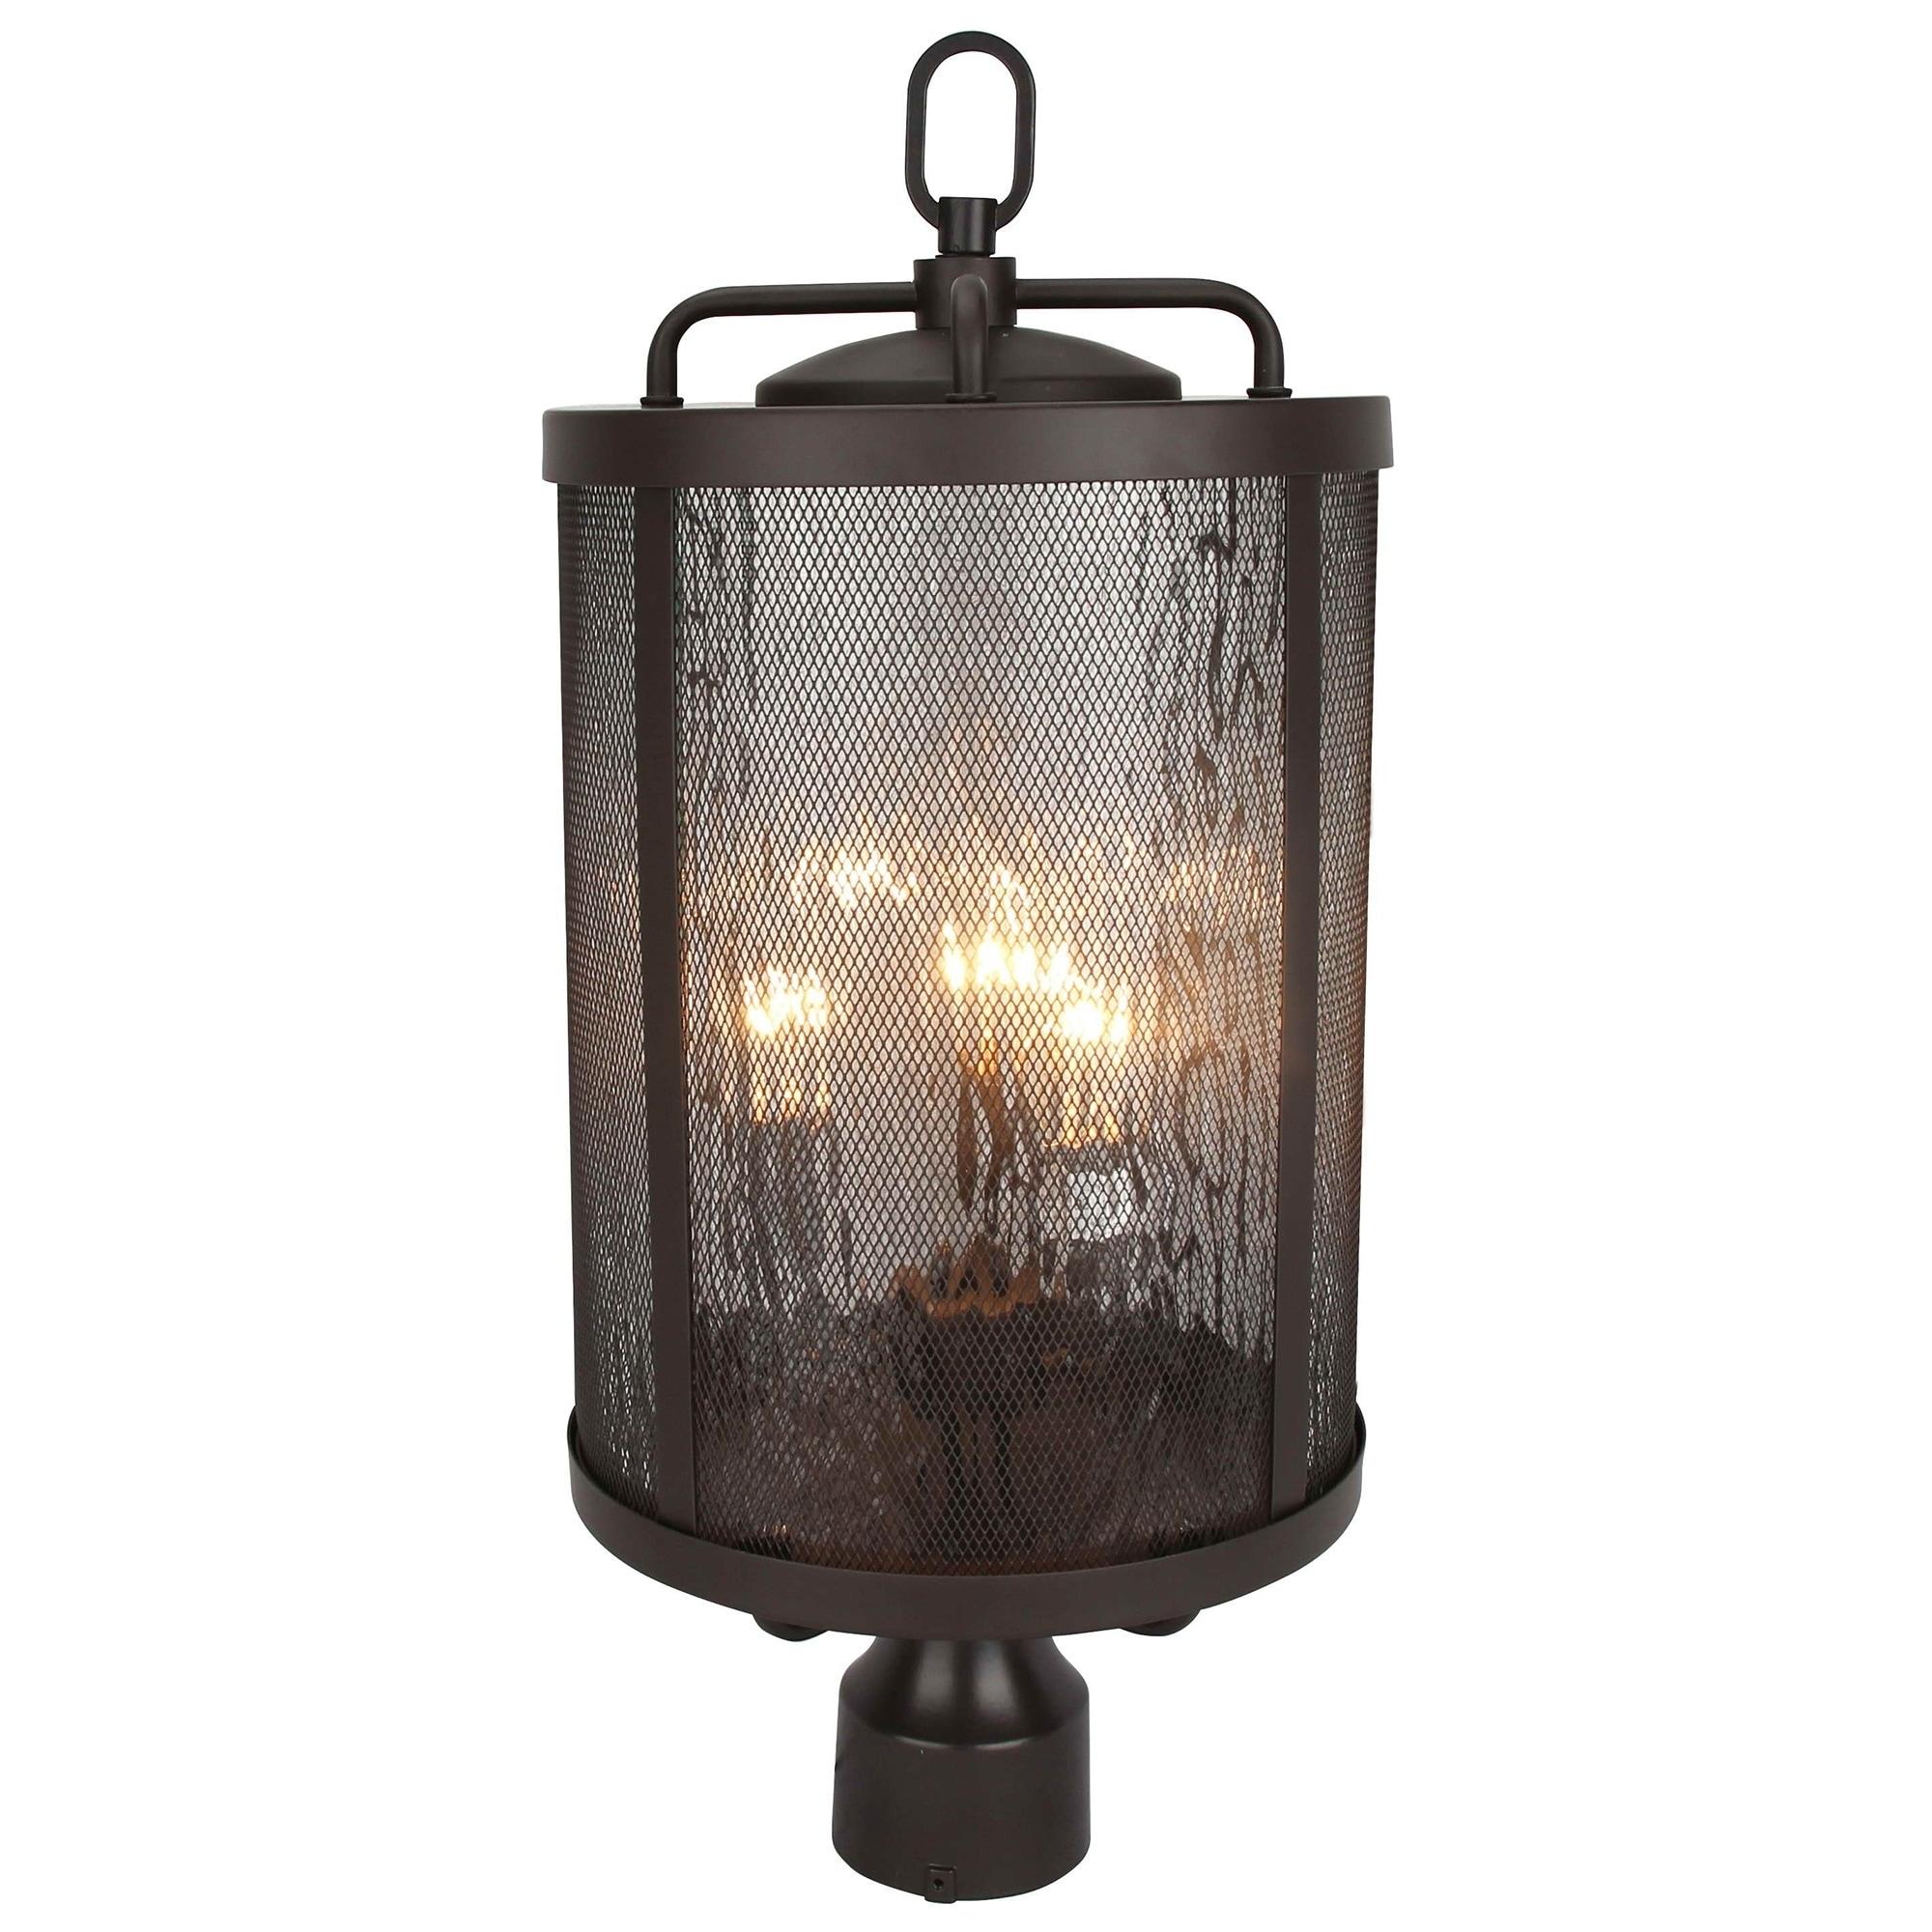 Shop 3 Light Outdoor Post Lighting In Bronze Finish On Sale Overstock 28868693